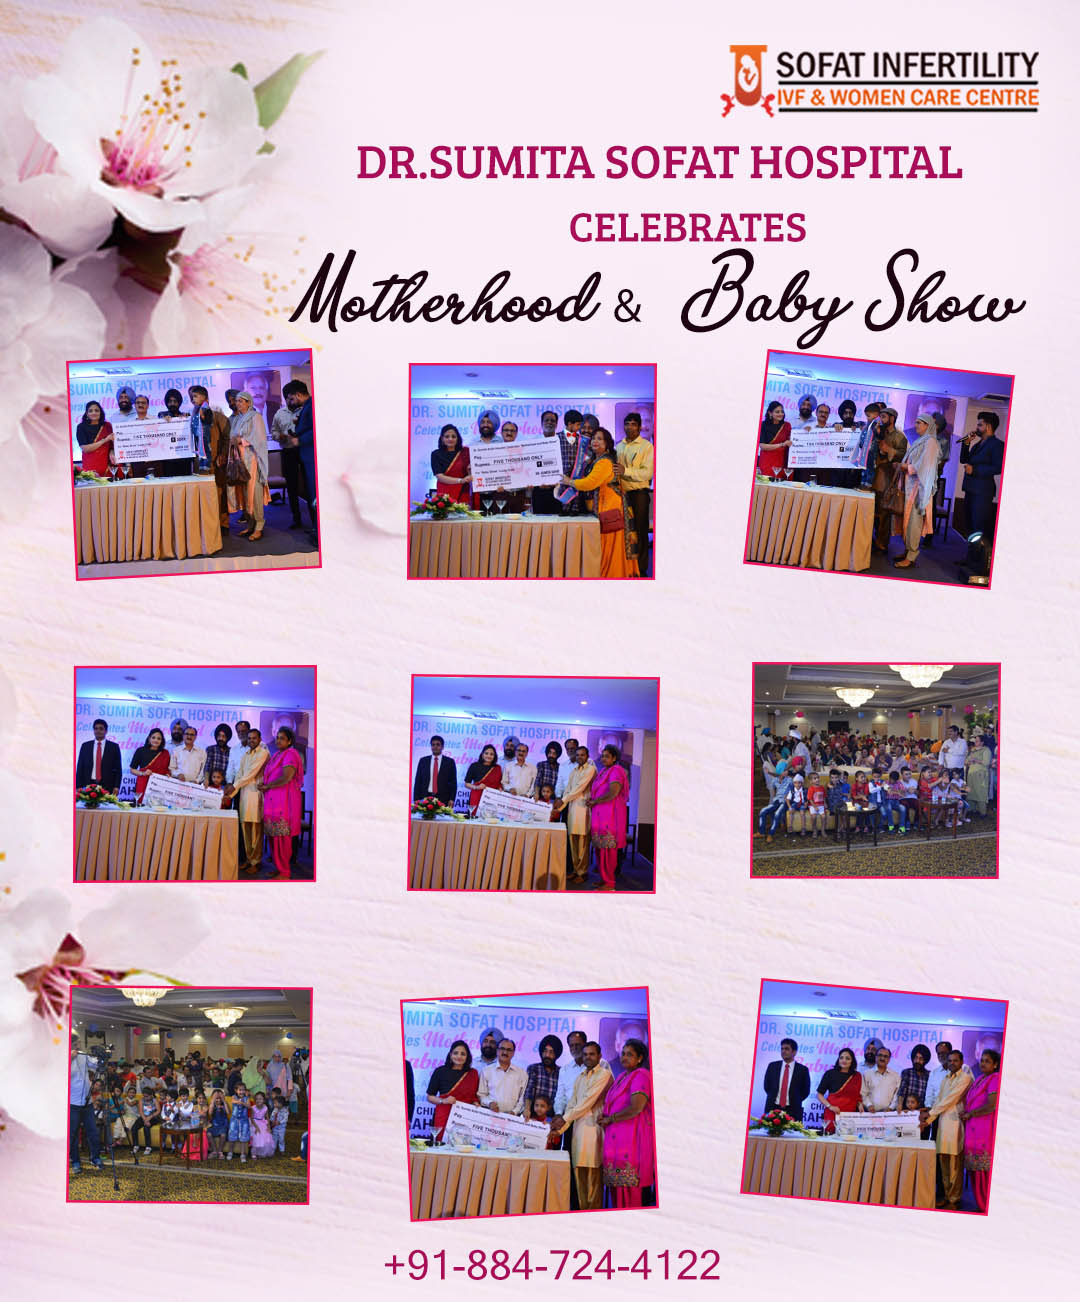 Dr. Sumita Sofat organized a Motherhood & Baby Show